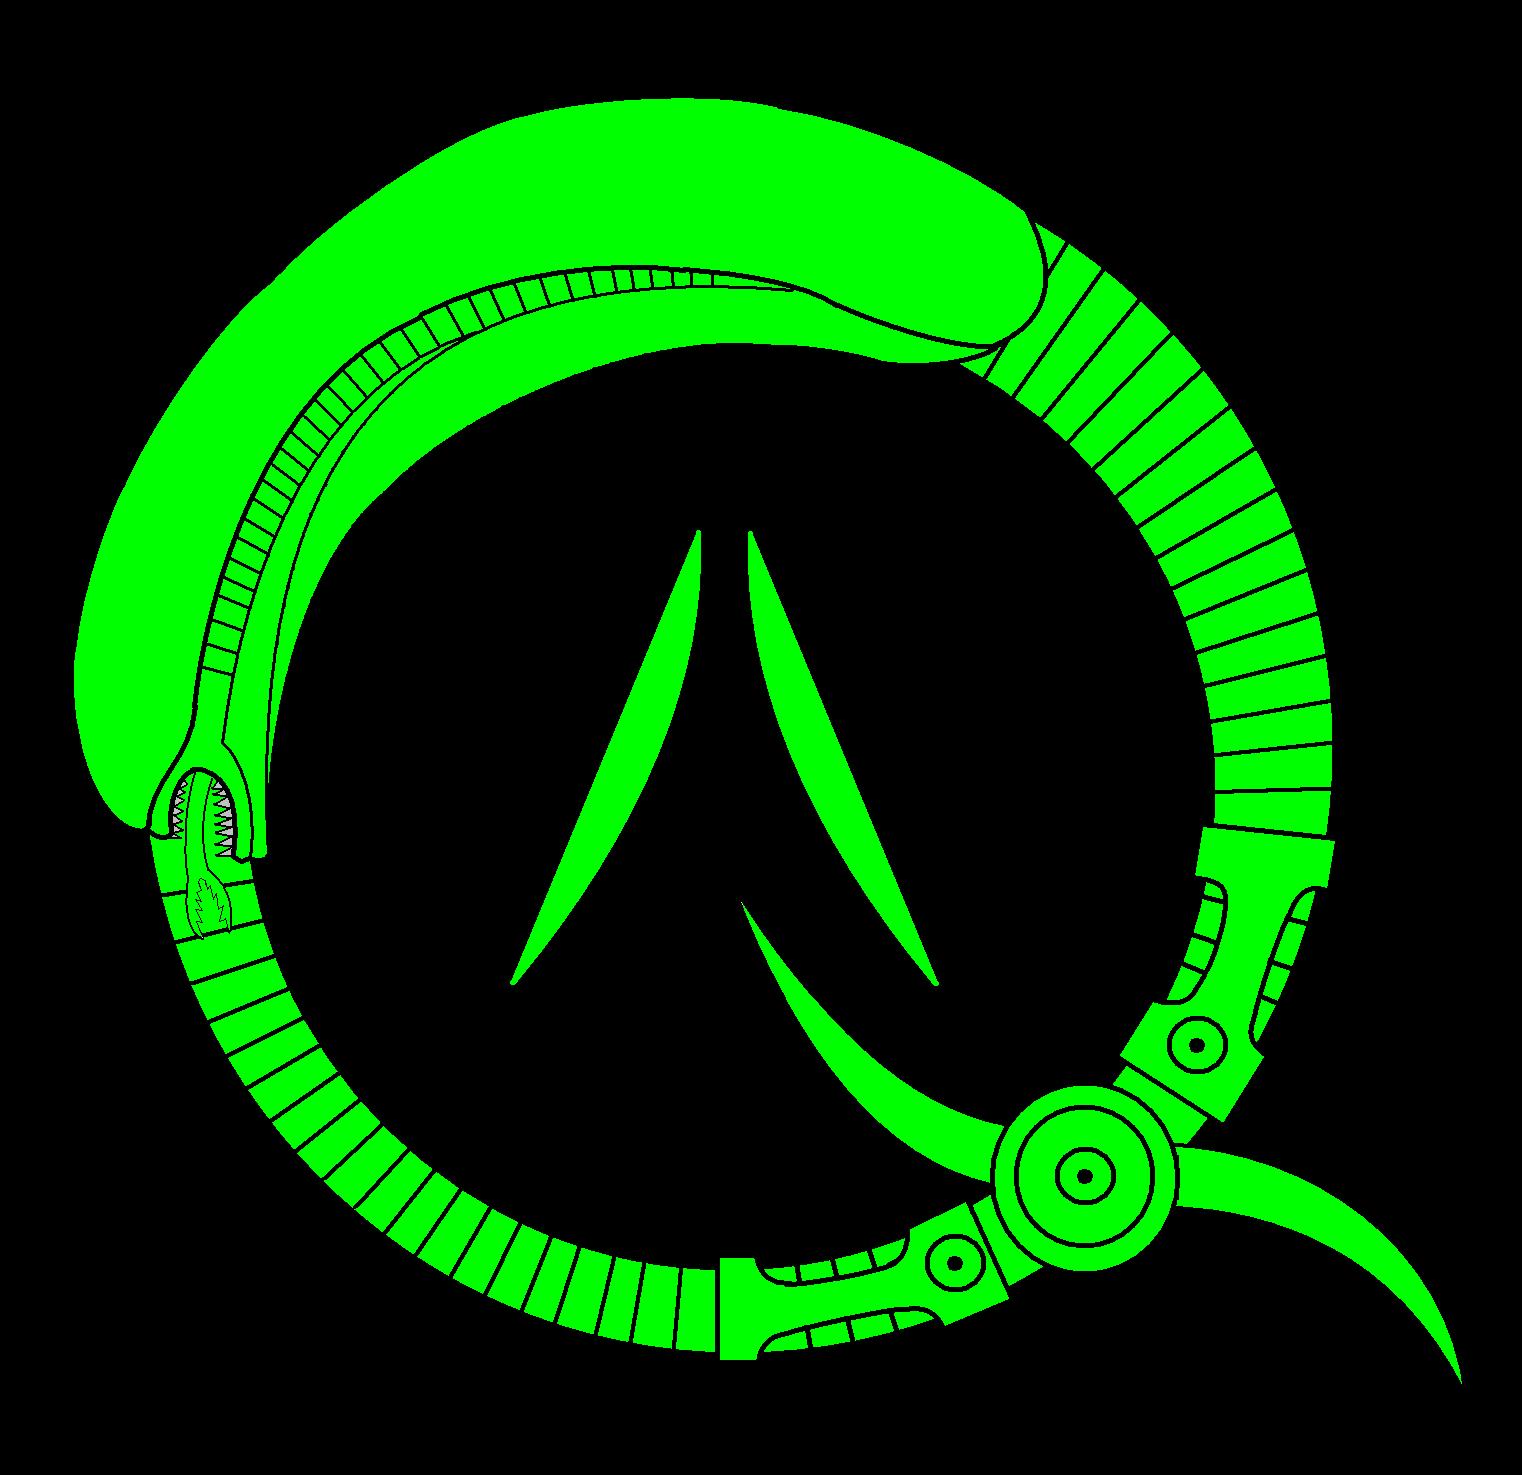 File:Alien logo b.png.